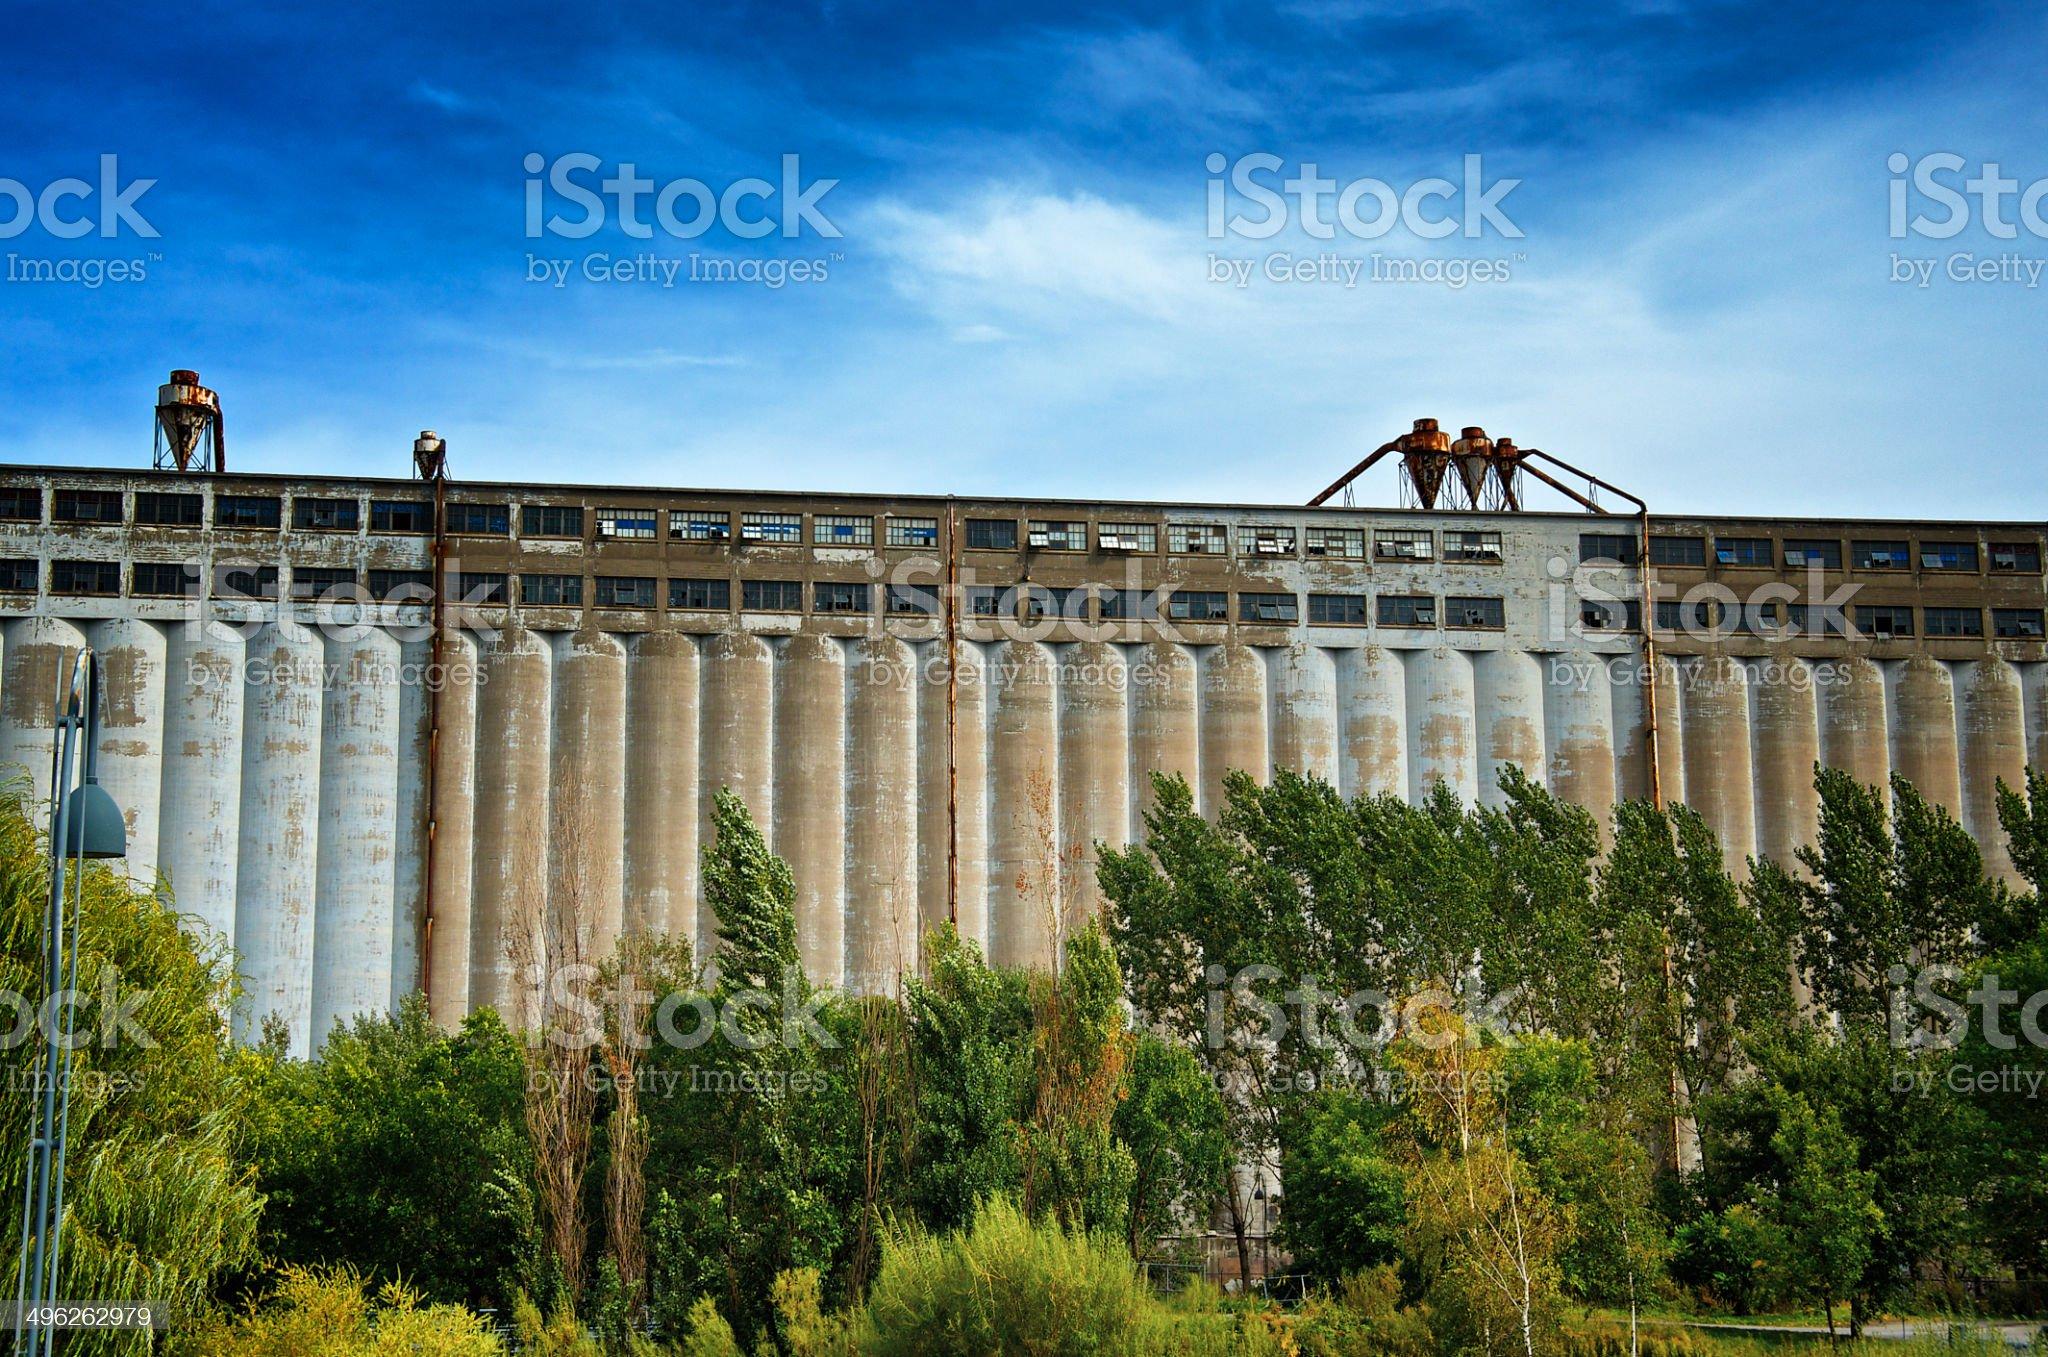 Vacant Grain Silo No.5, Pointe-du-Moulin, Montreal, Quebec, Canada royalty-free stock photo